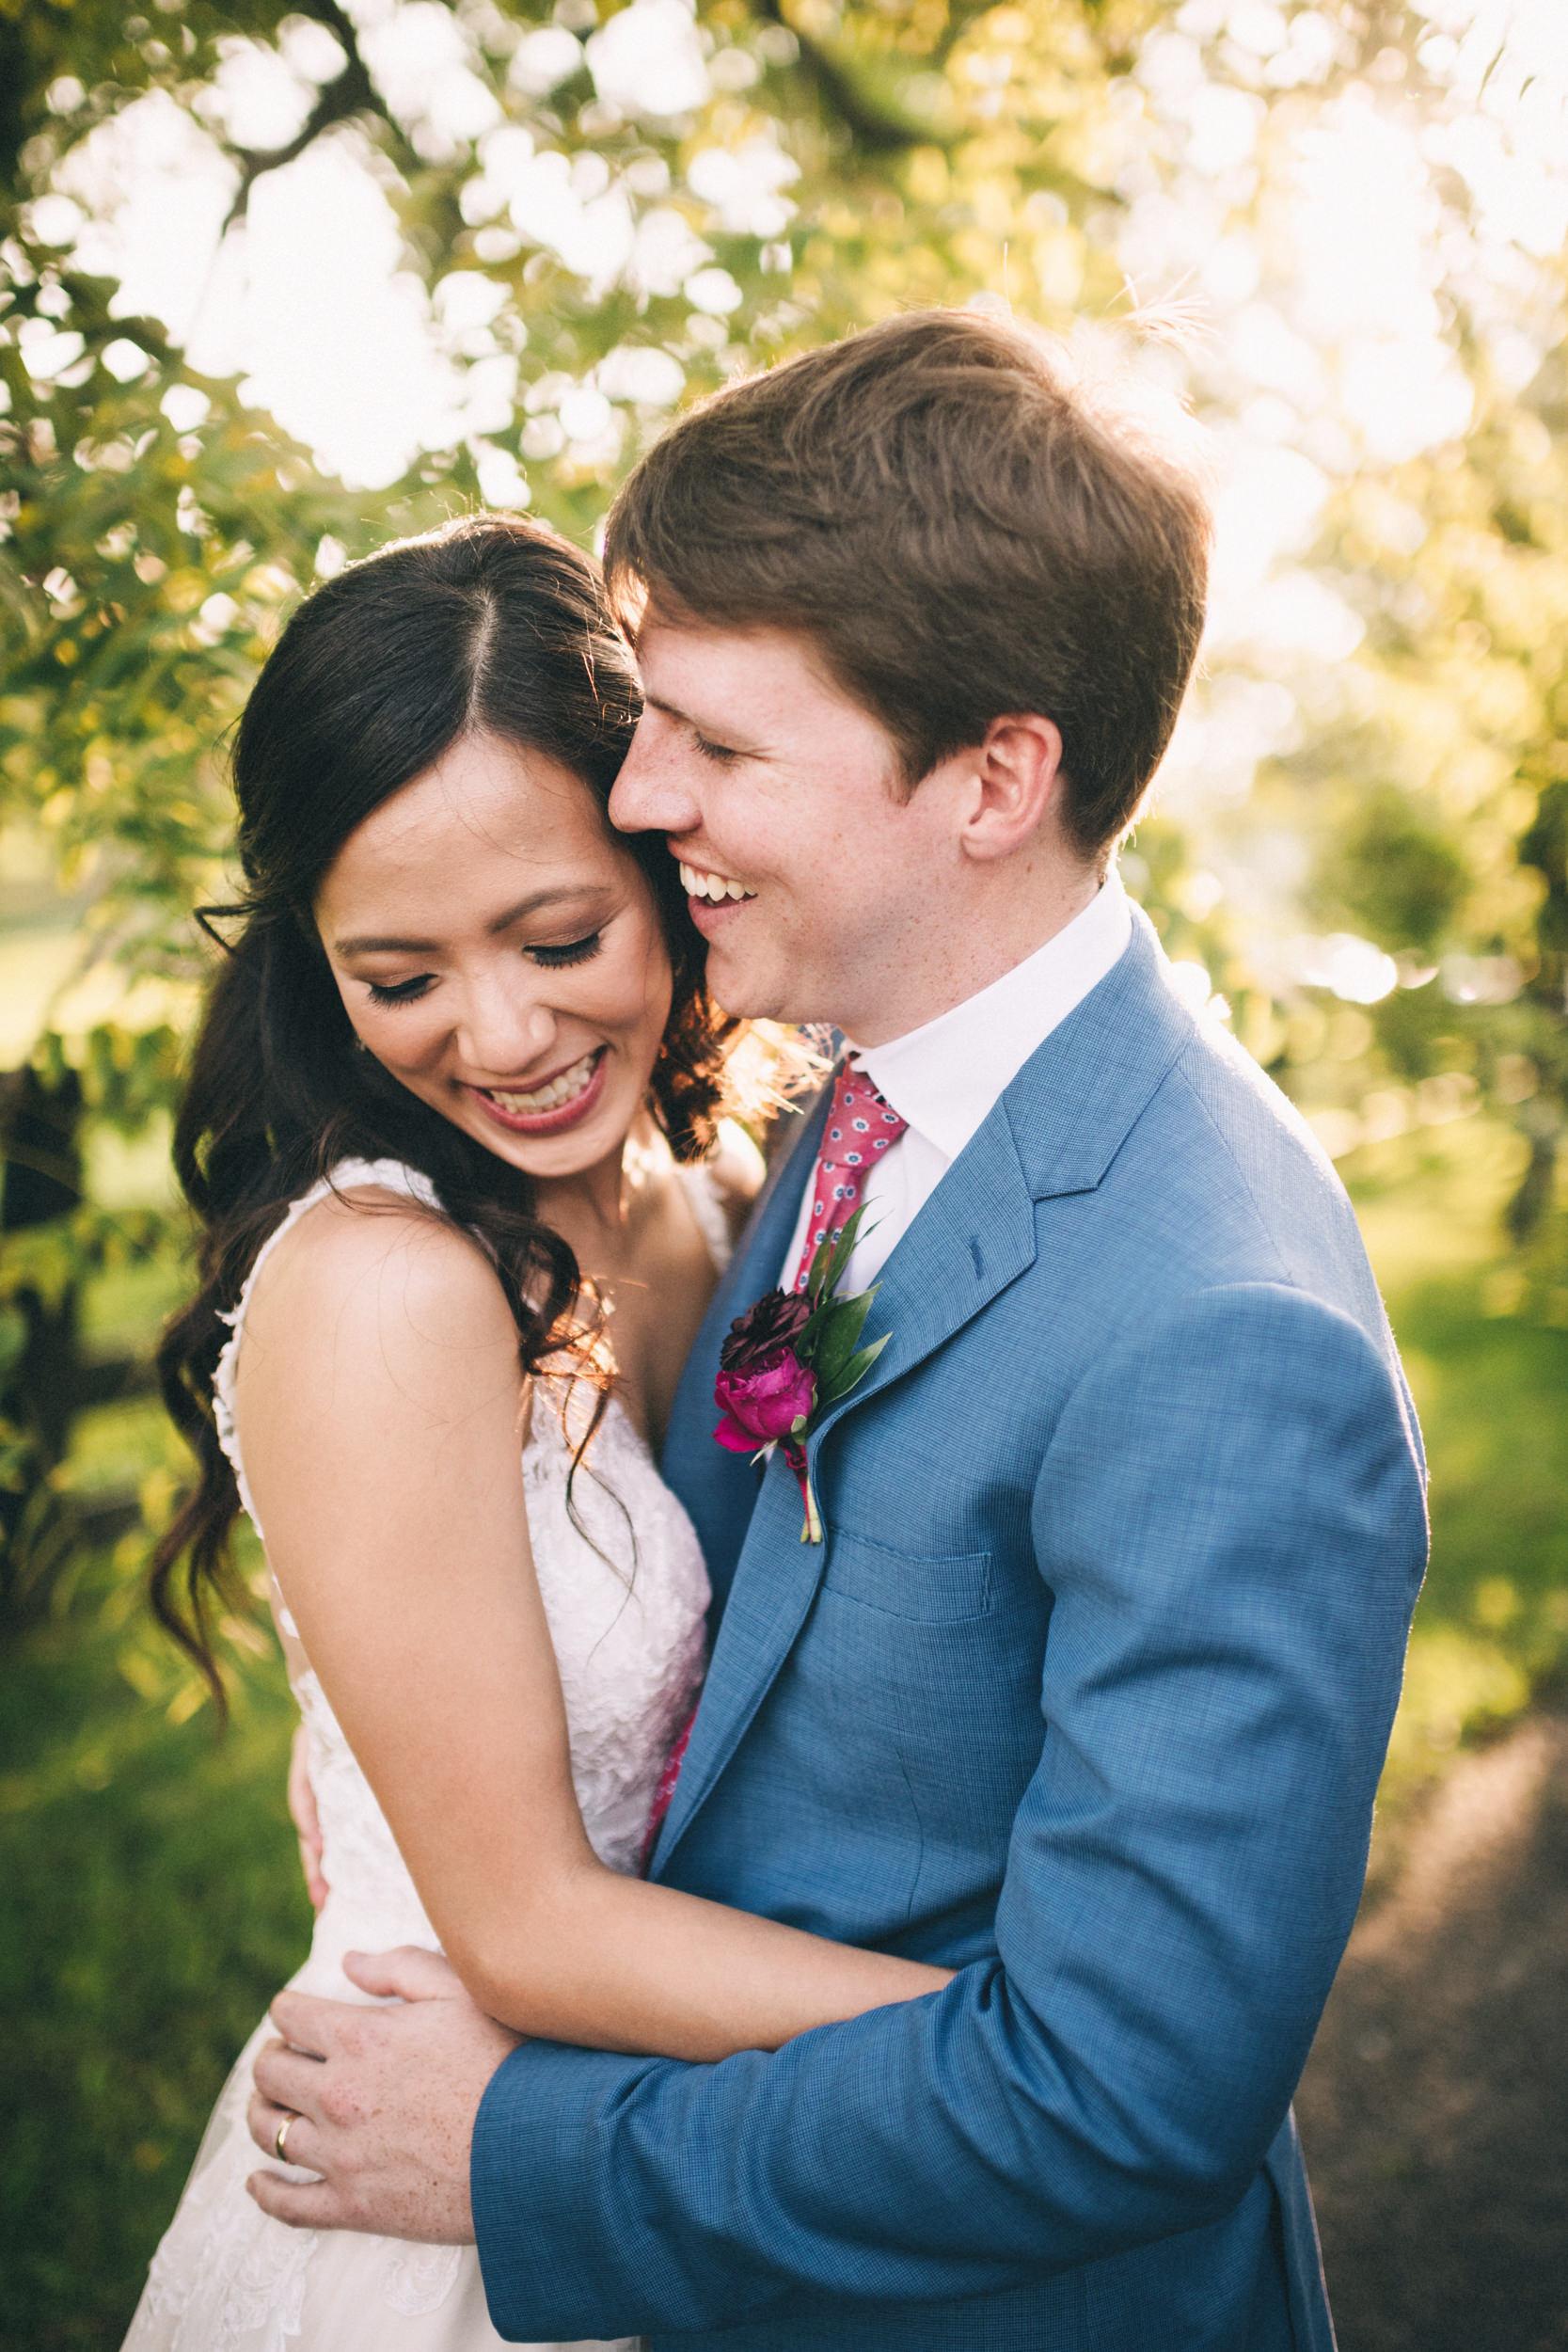 Louisville-Kentucky-Wedding-and-Elopement-Photographer-Sarah-Katherine-Davis-Photography-Summer-Jewel-Toned-Wedding-Chineese-Tea-Ceremony-Warrenwood-Manor-Danville-654.jpg